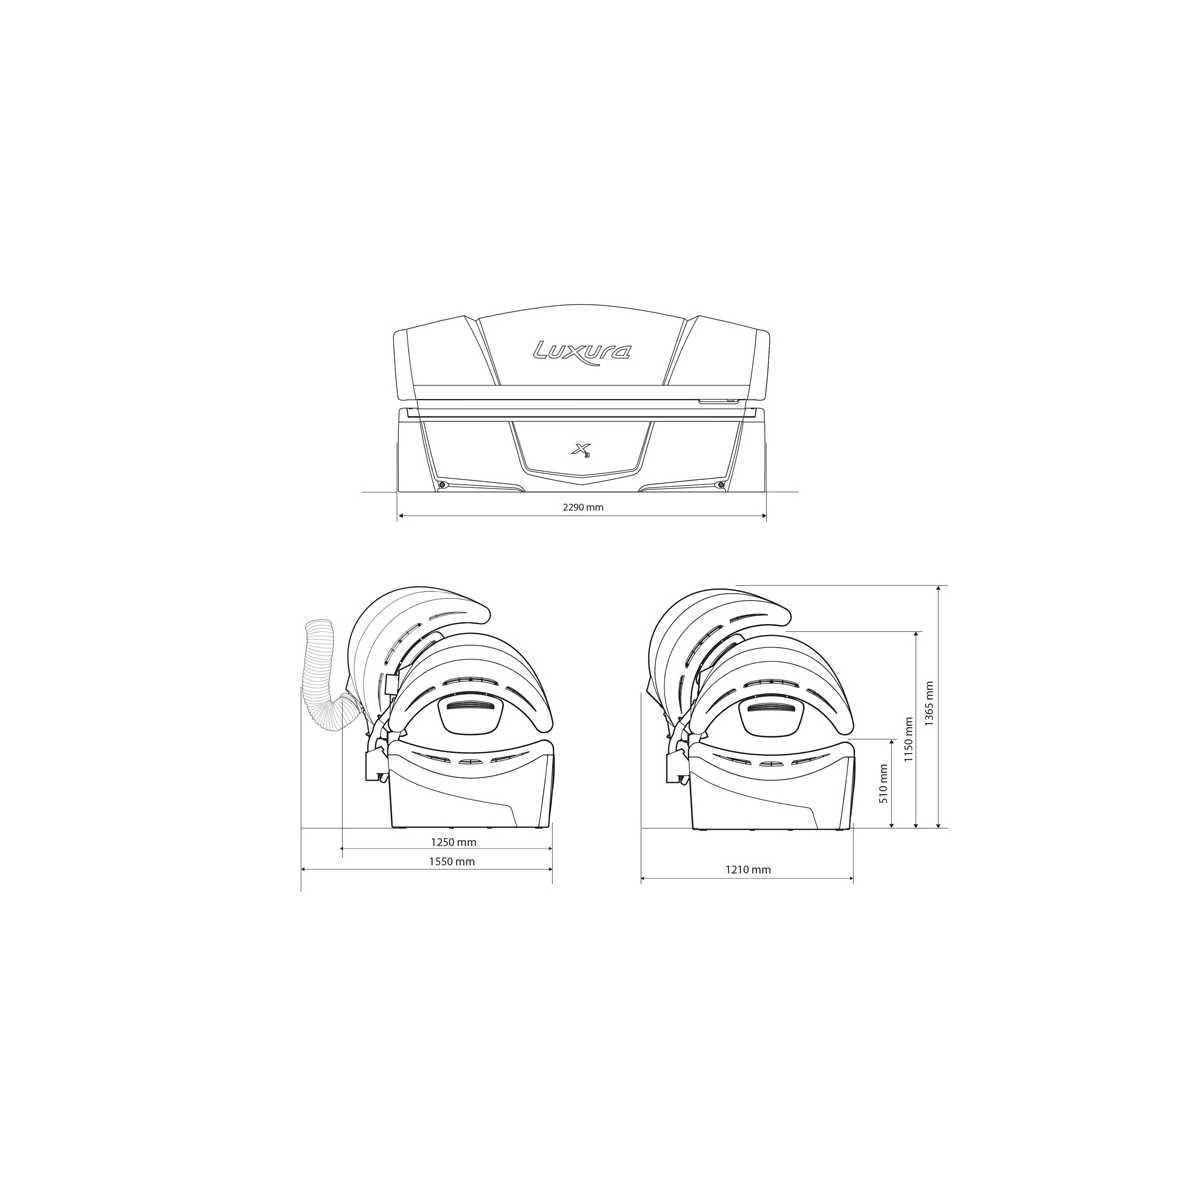 Hapro Luxura X3 32 SLI Intensive